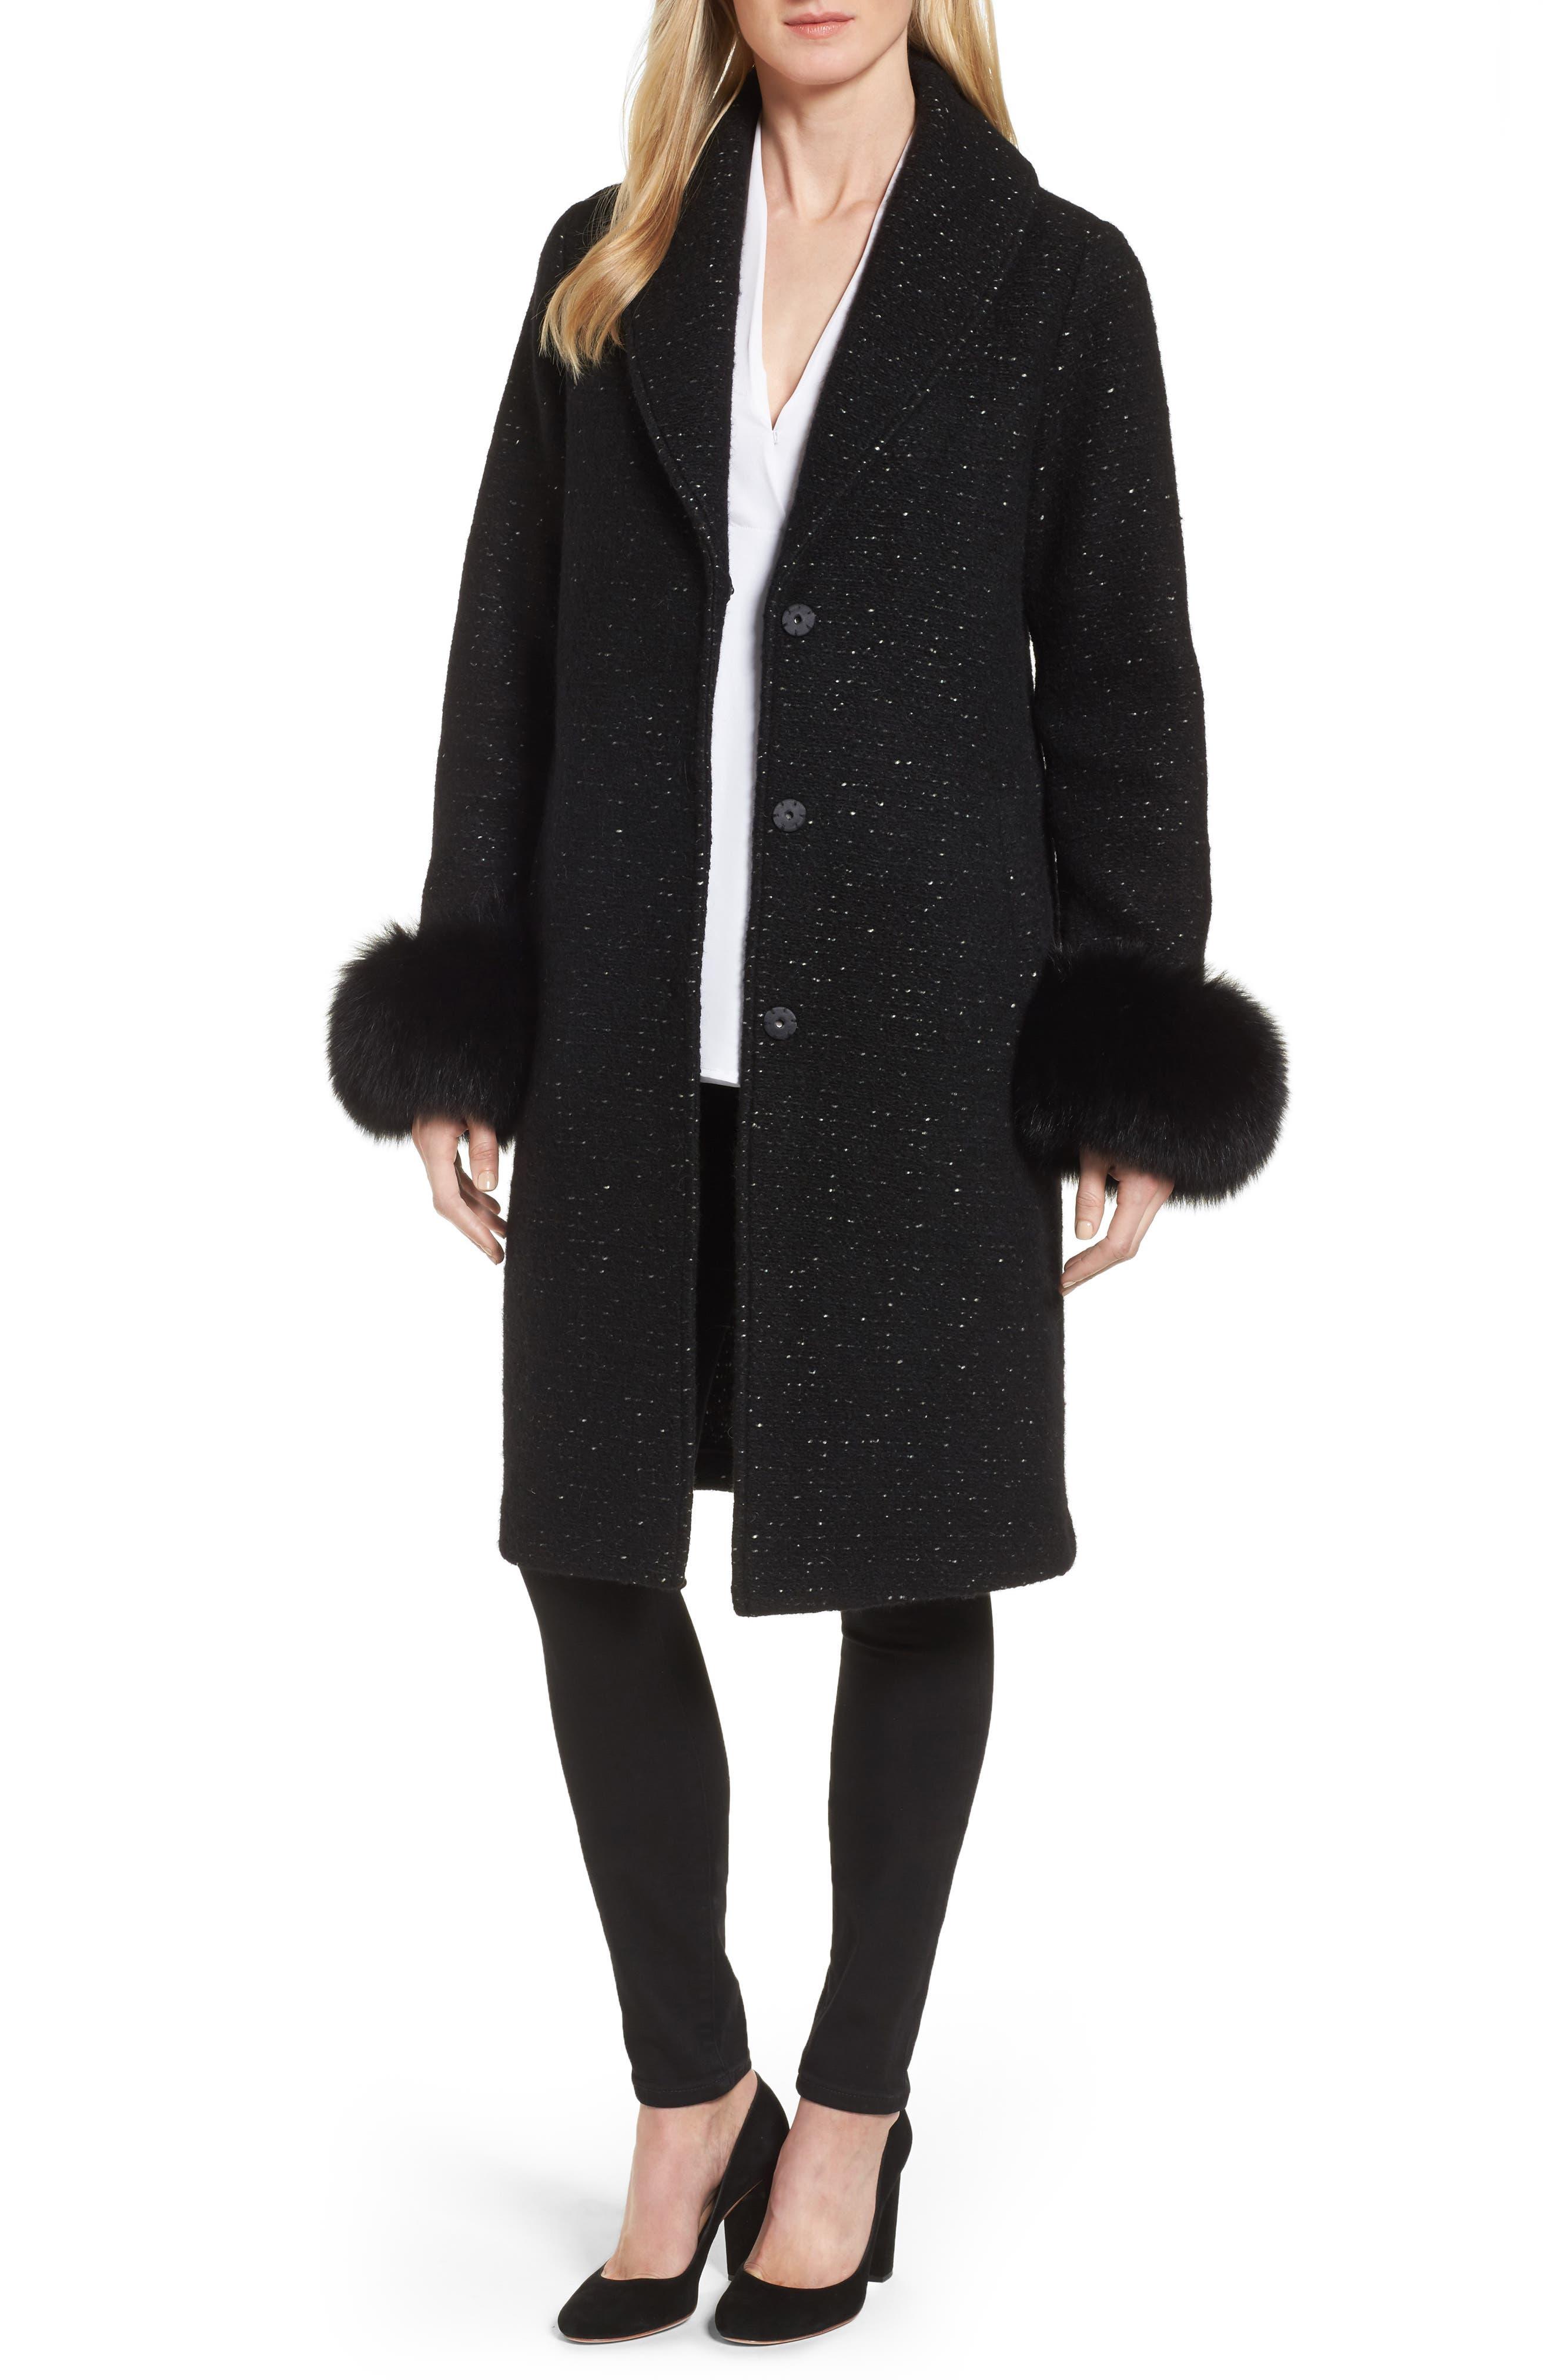 Alternate Image 1 Selected - Elie Tahari Grace Genuine Fox Fur Trim Knit Wool Blend Long Coat